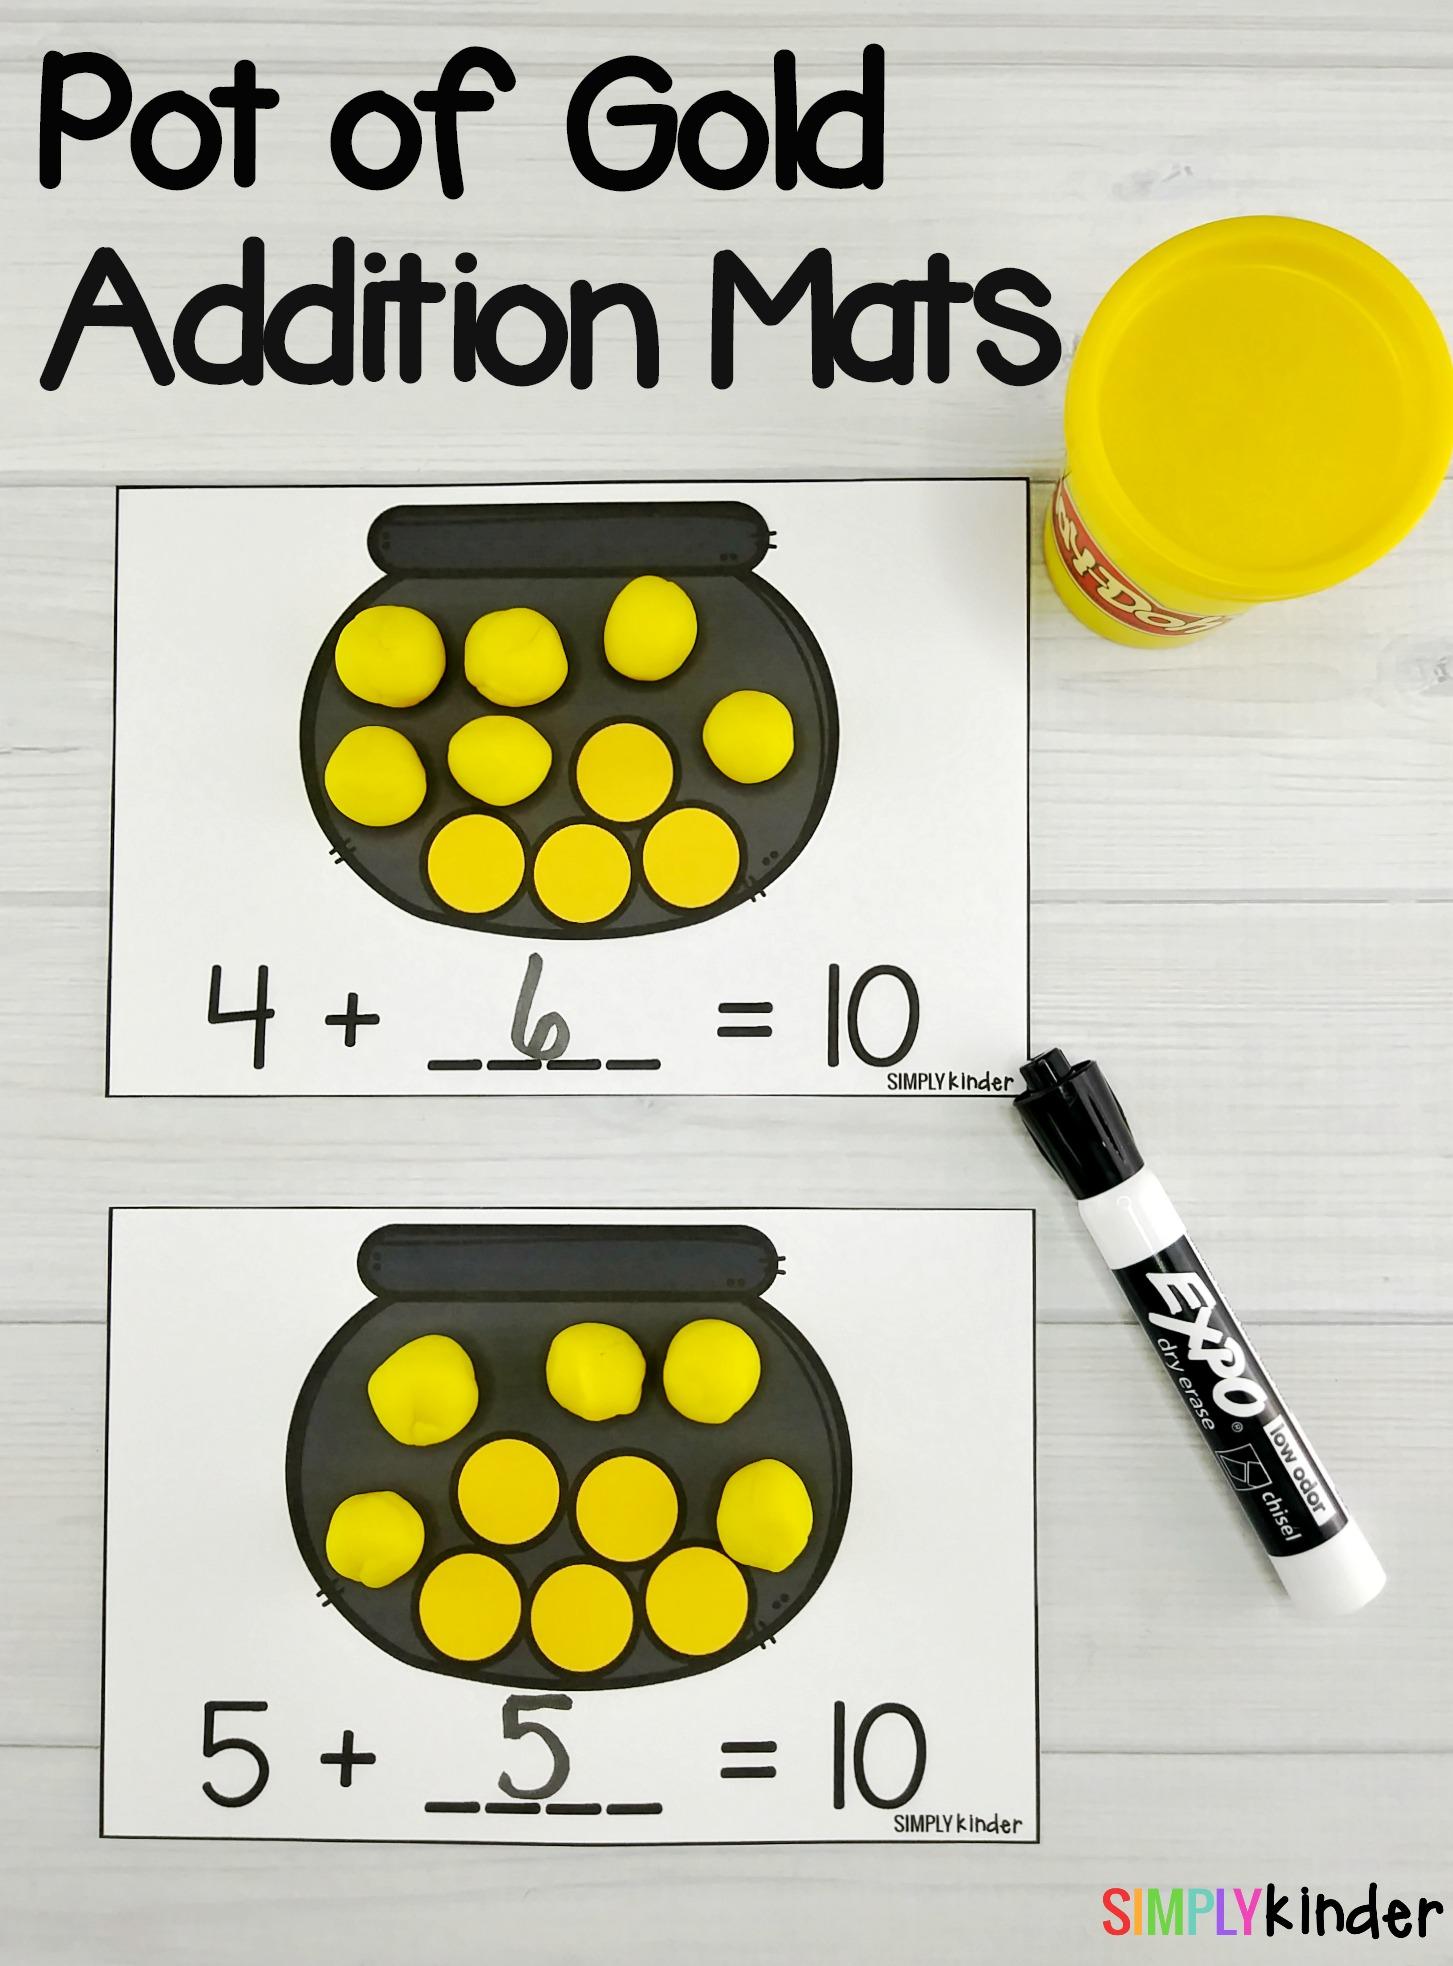 Pot of Gold Addition Mats